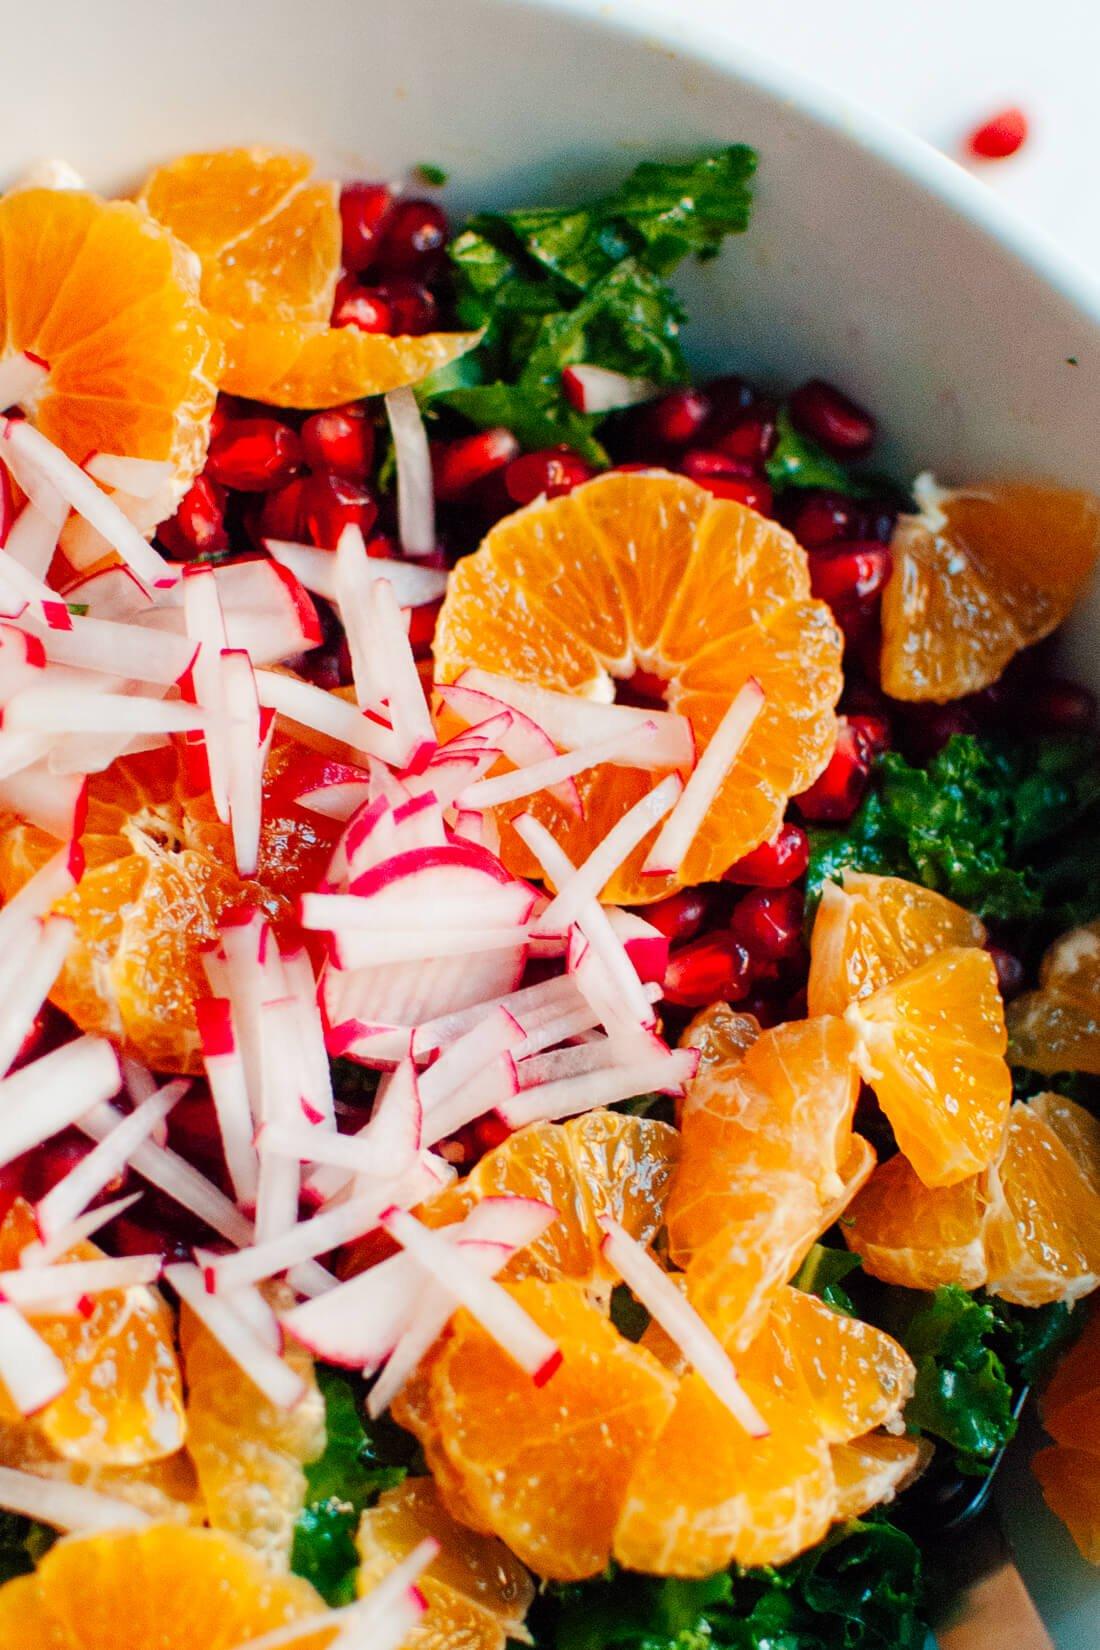 Radish, clementine, pomegranate and kale salad